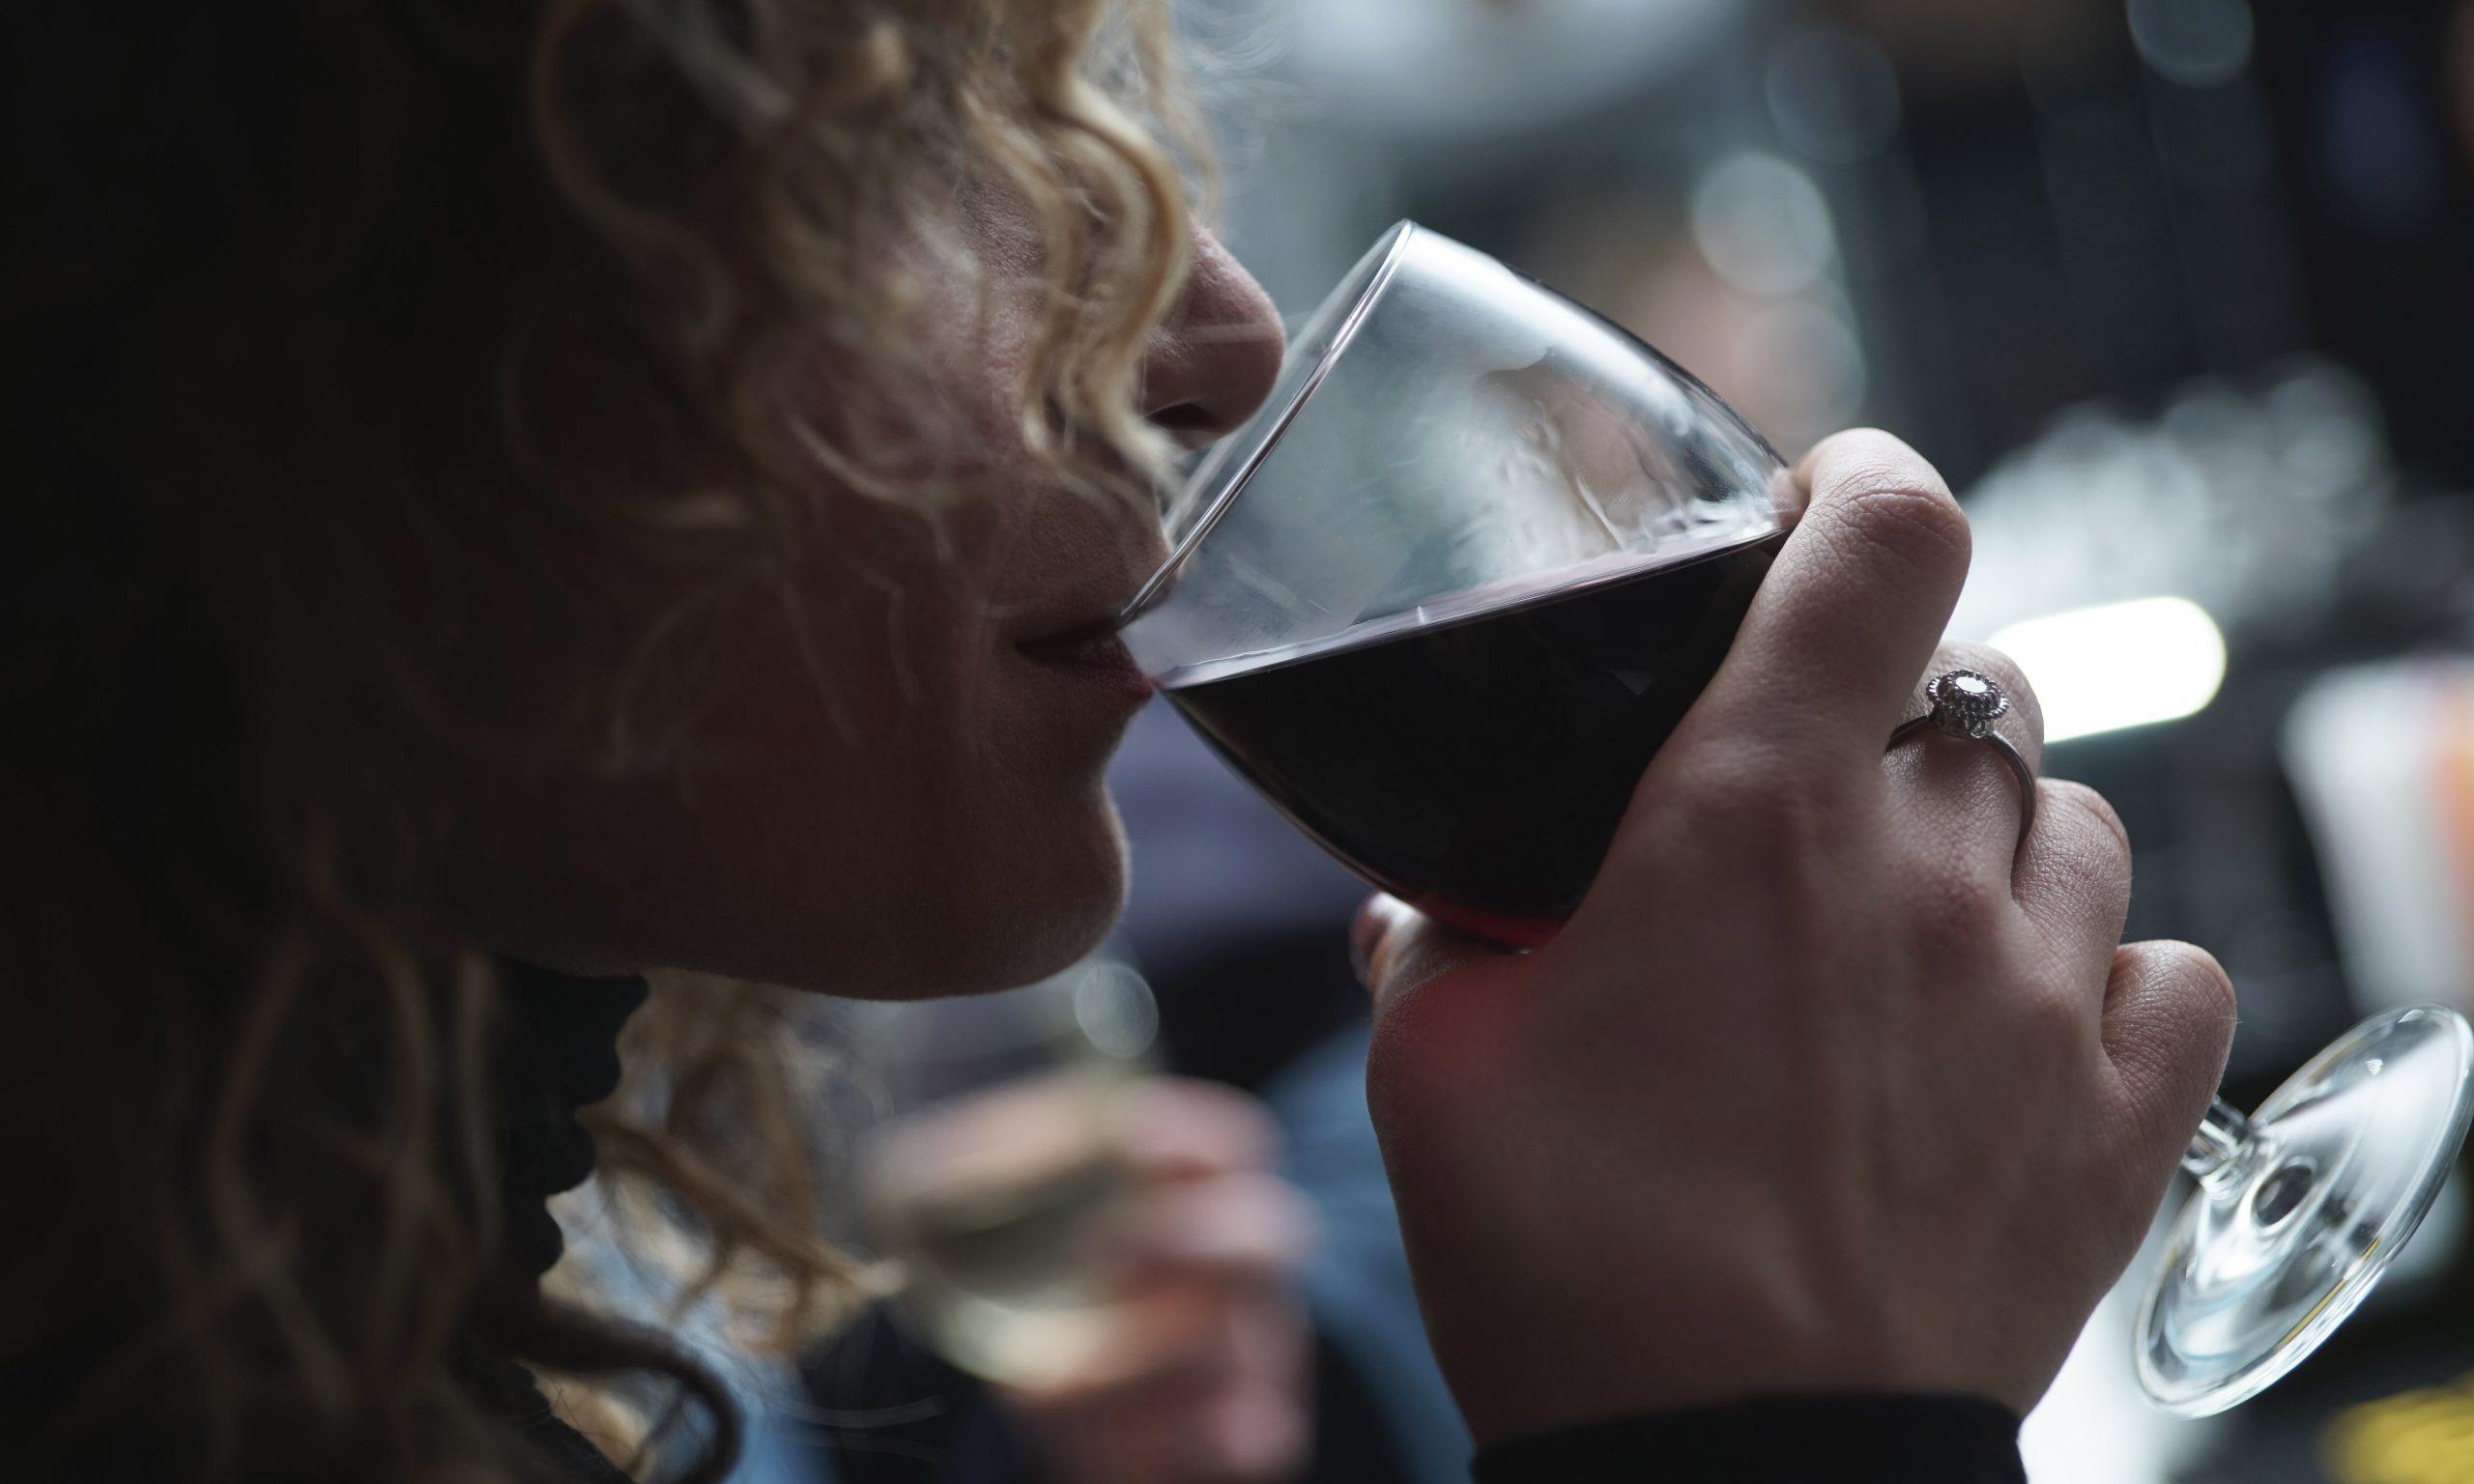 Has the NHS introduced an alcohol ban to tackle coronavirus?